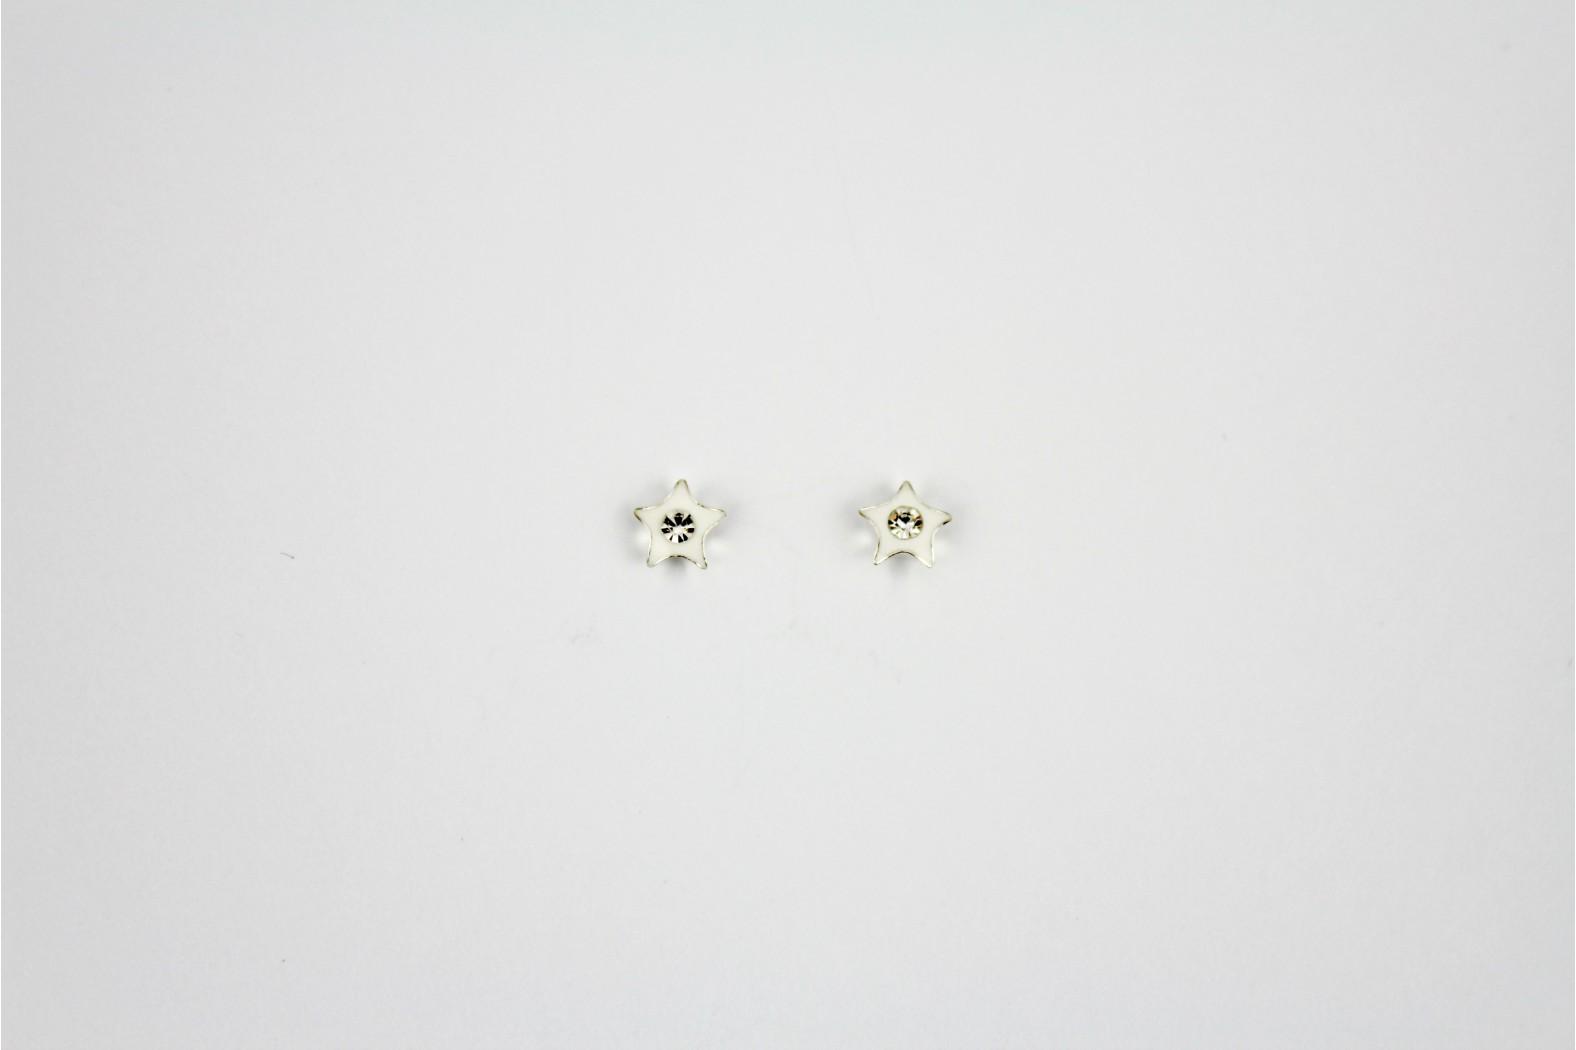 Star White Enamel with Crystal inlay stud earrings